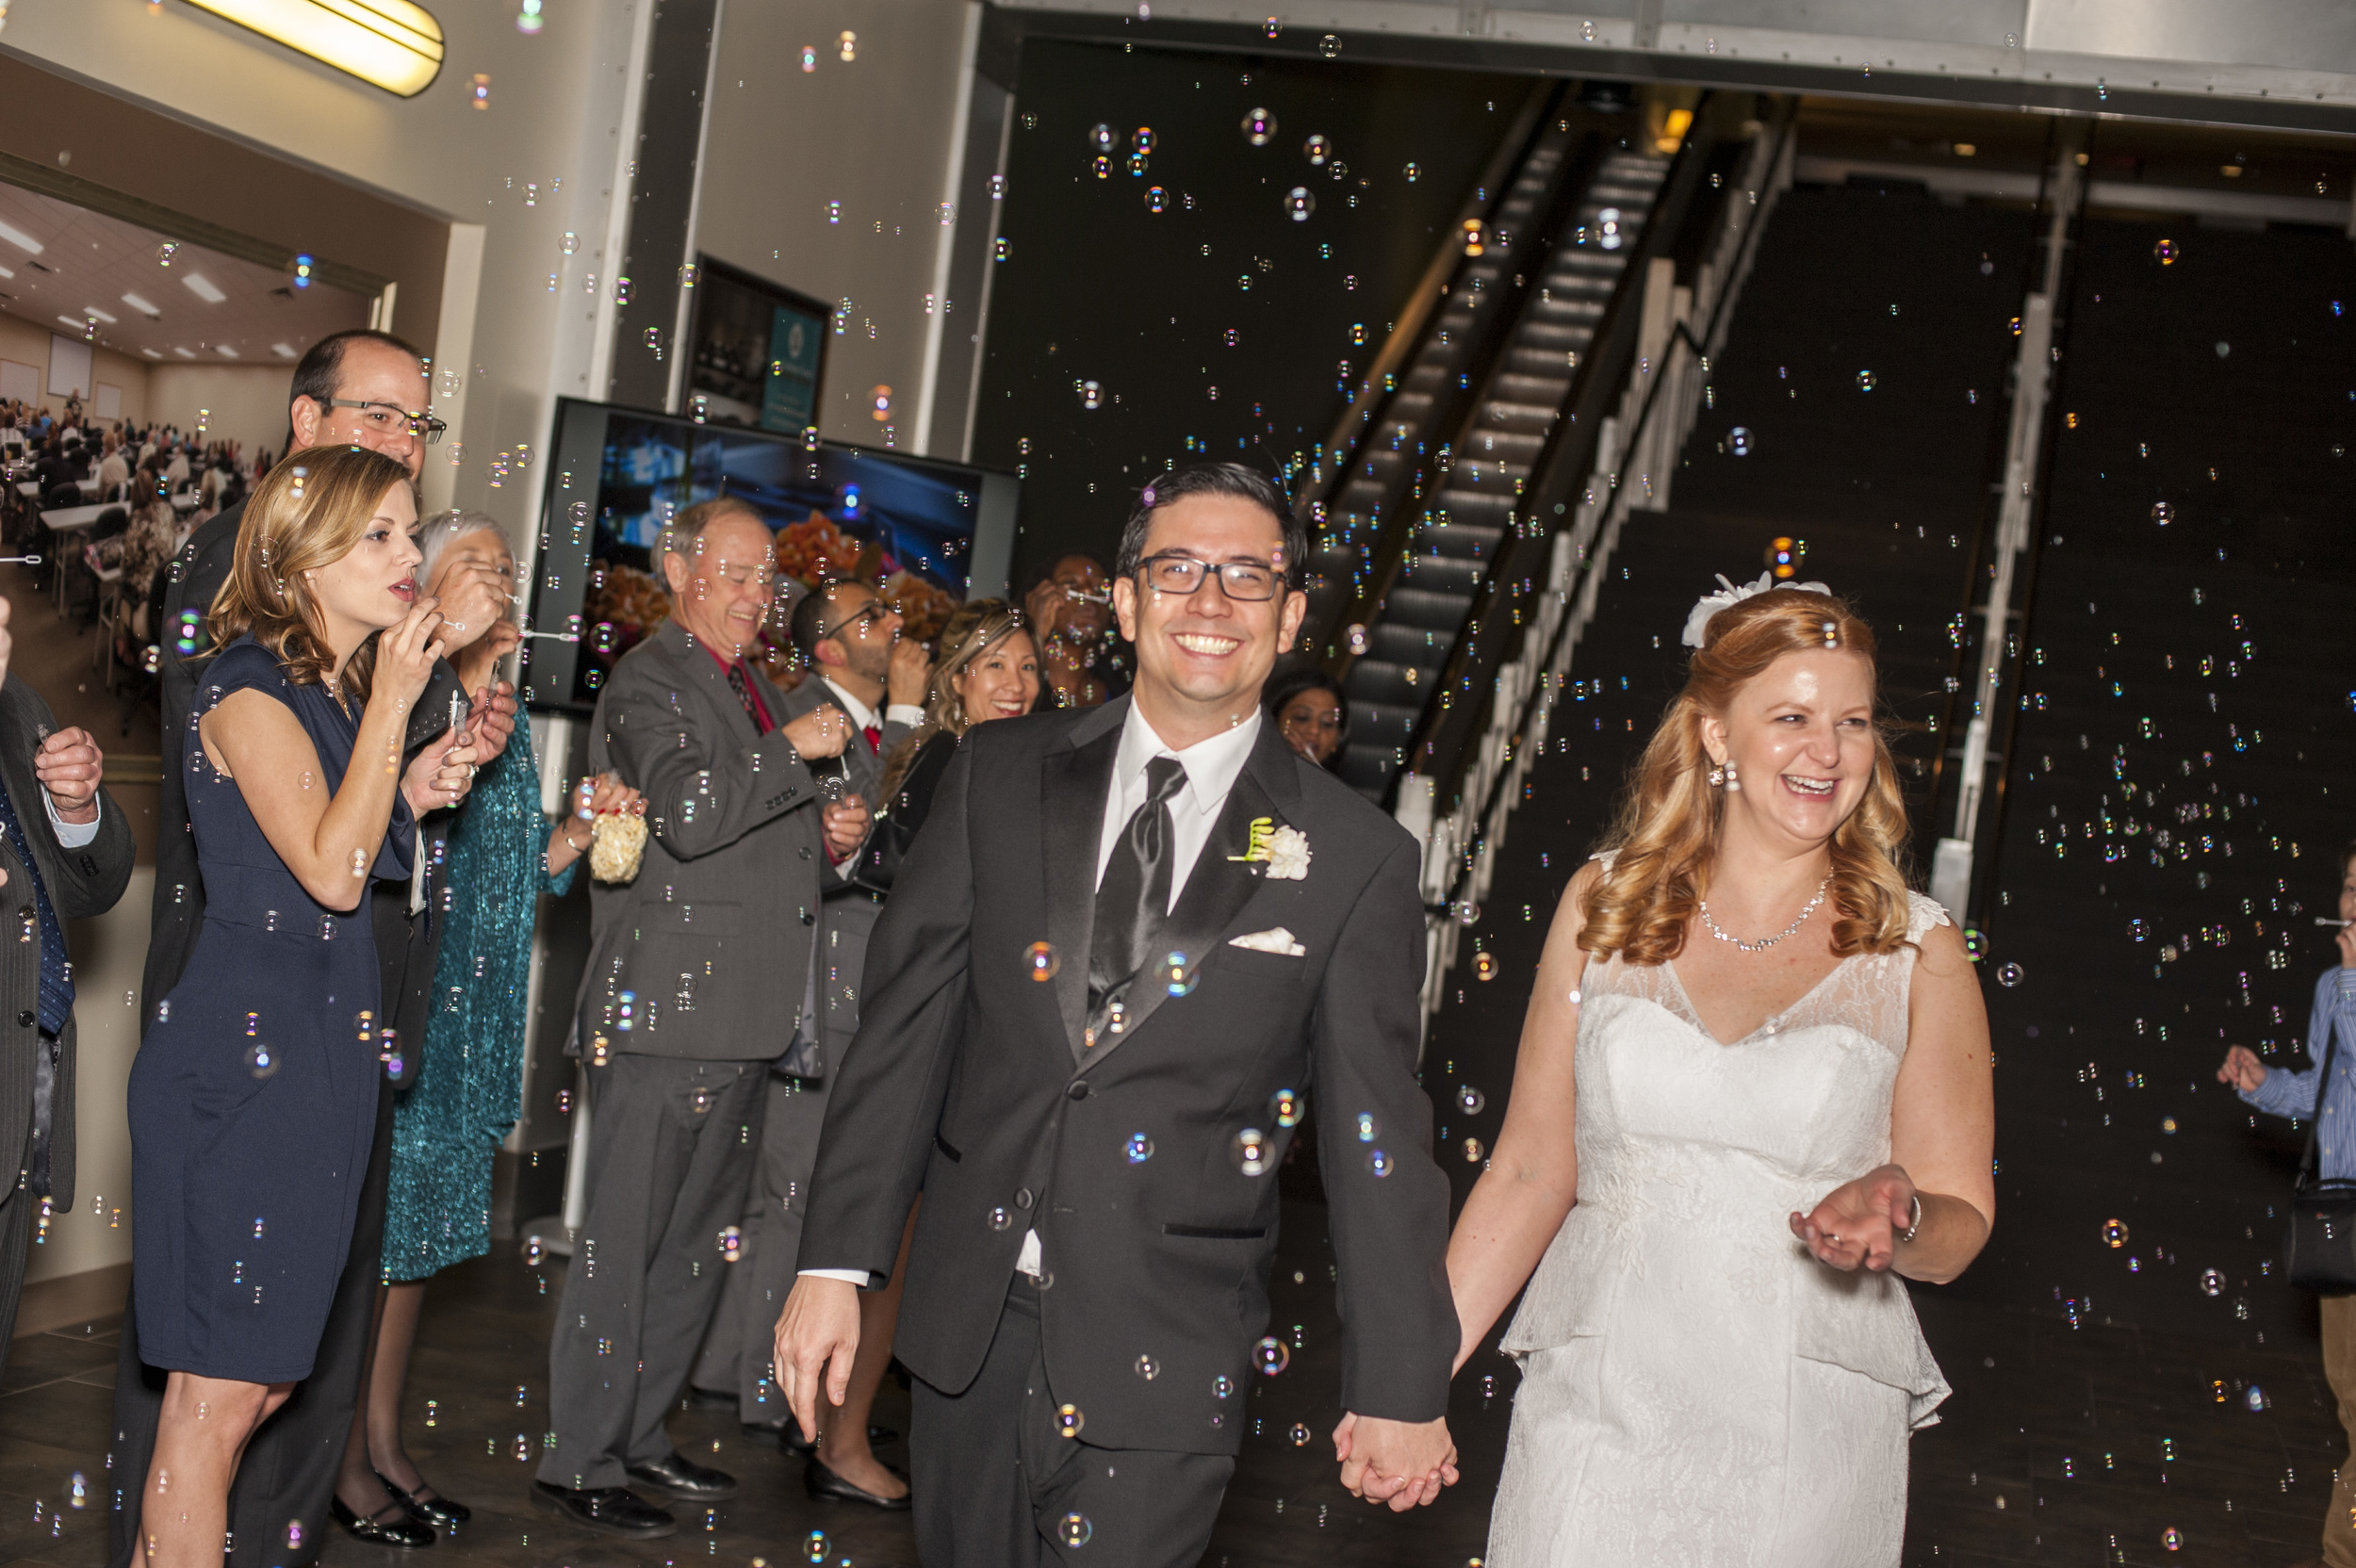 Wedding at Red Oak Ballroom in Fort Worth